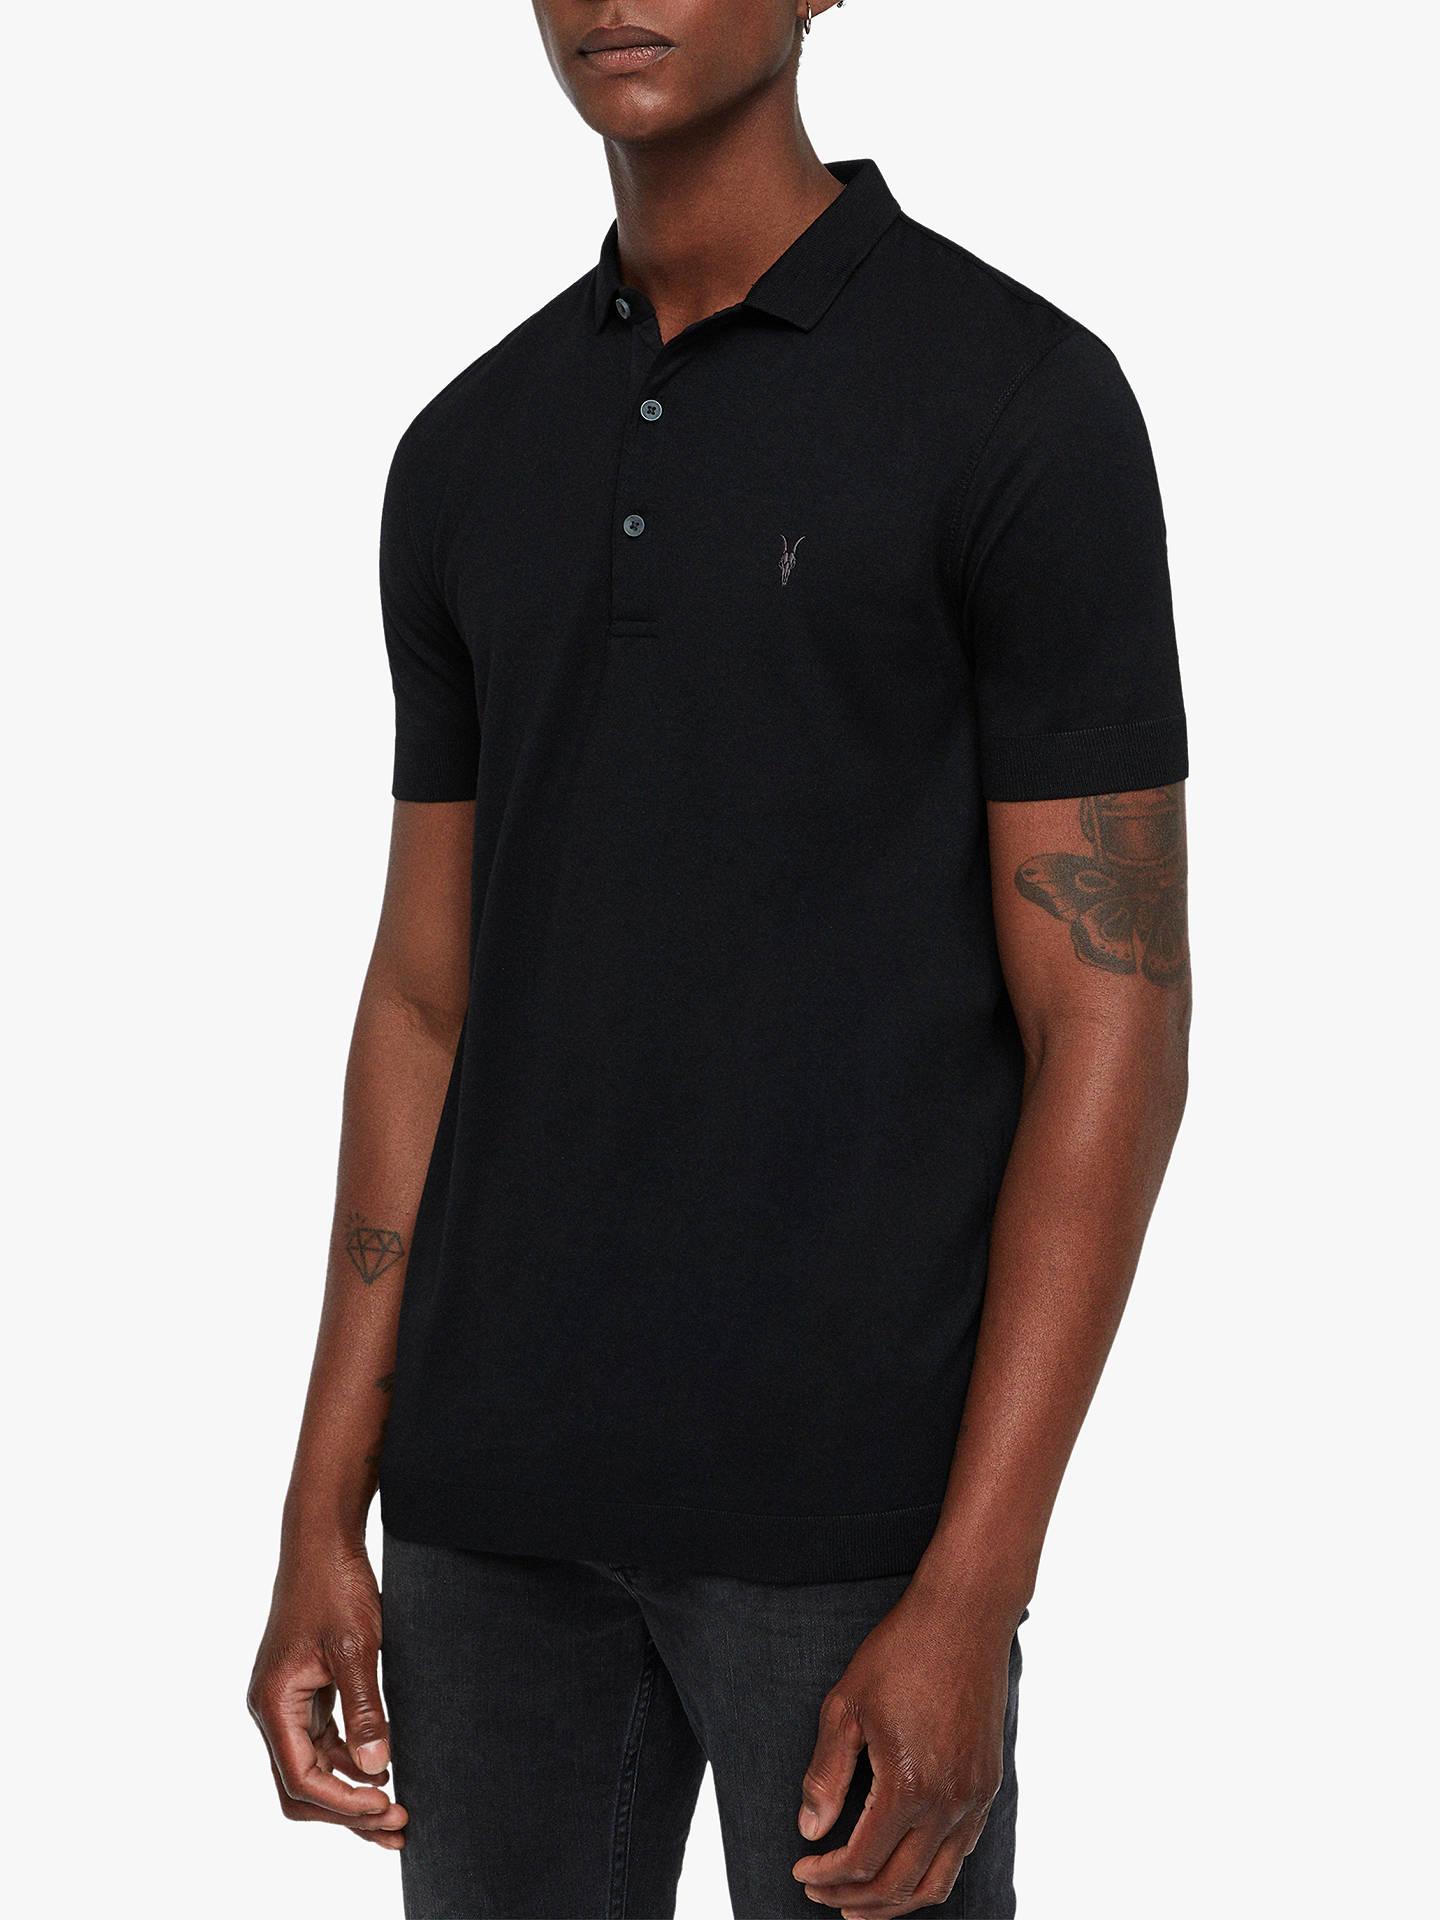 a4ca6854 Buy AllSaints Parlour Short Sleeve Polo Shirt, Black, XS Online at  johnlewis.com ...